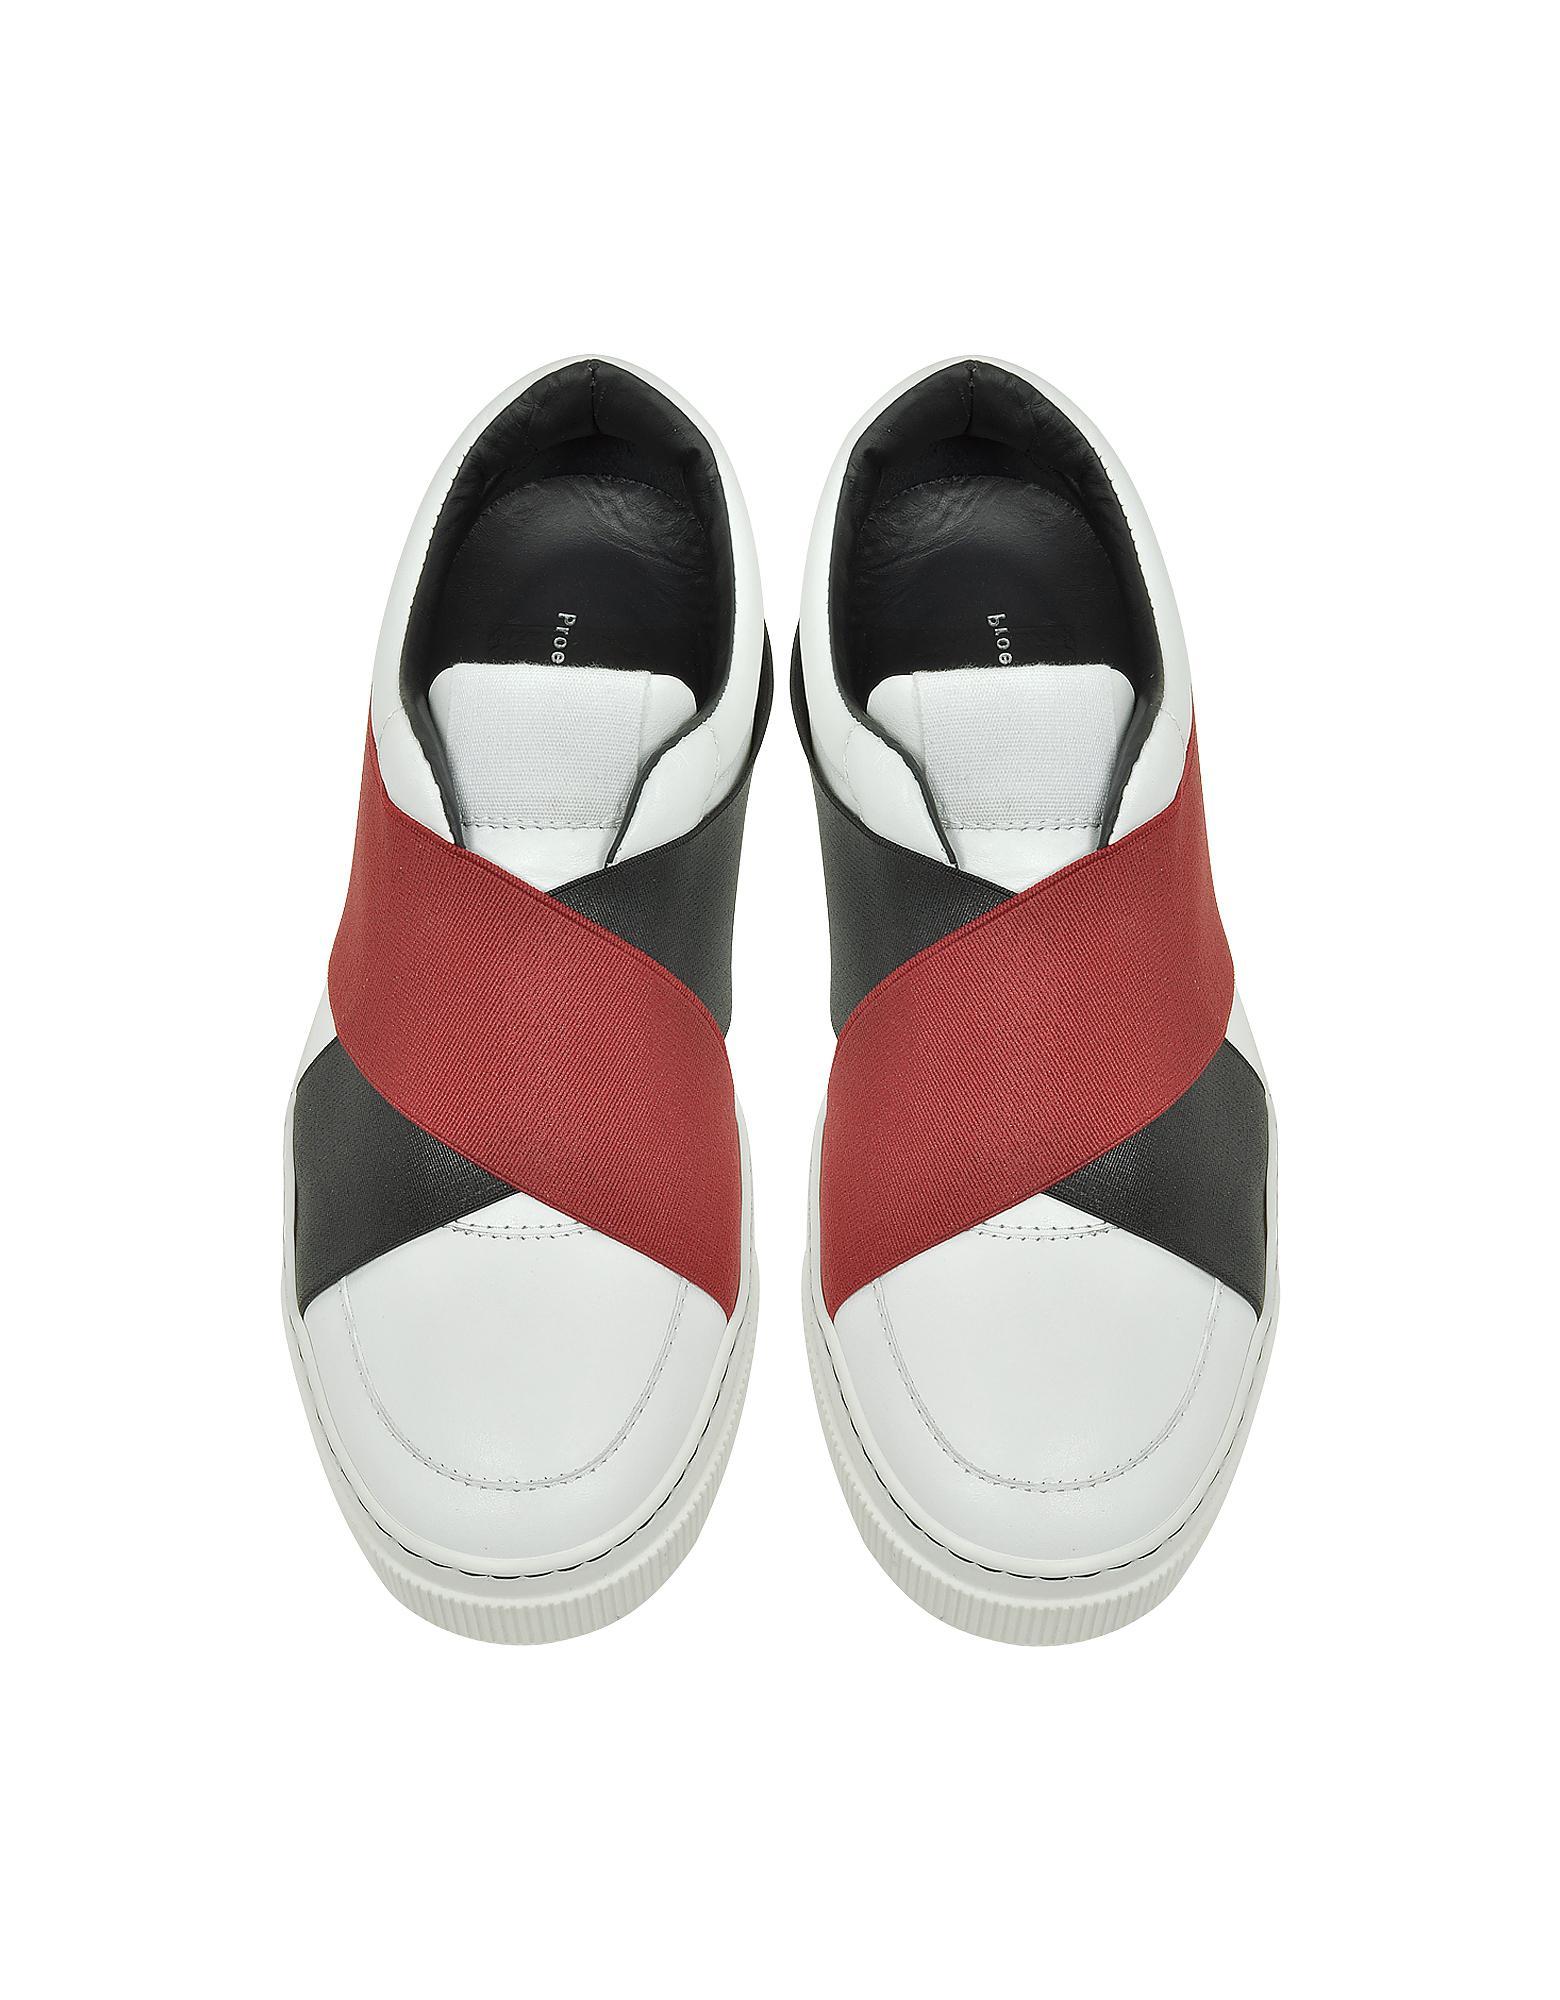 Proenza Schouler White Leather Slip On Sneaker W Two Tone